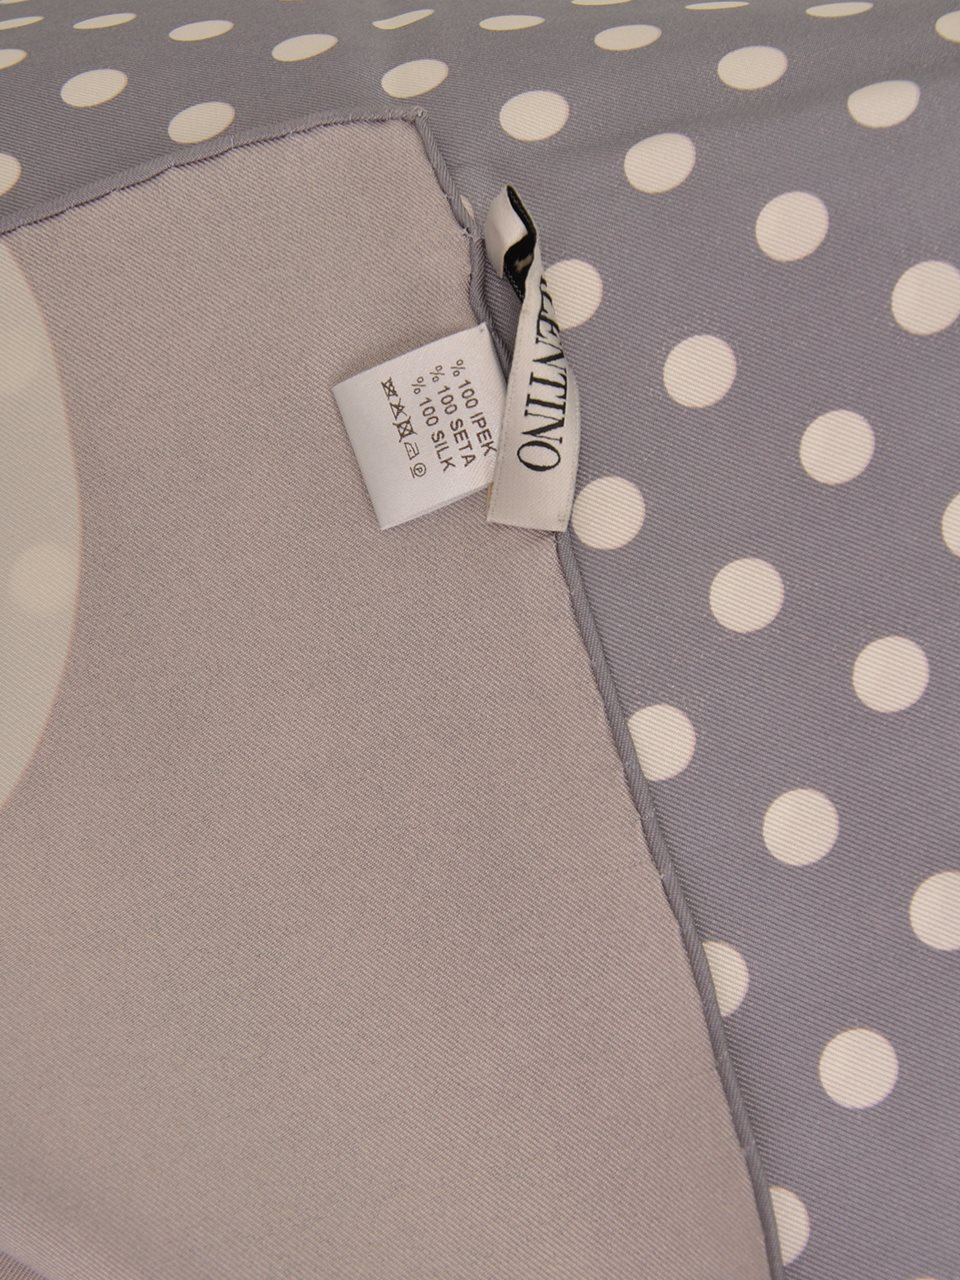 Valentino - Silk Twill Scarf - Image 2 of 3